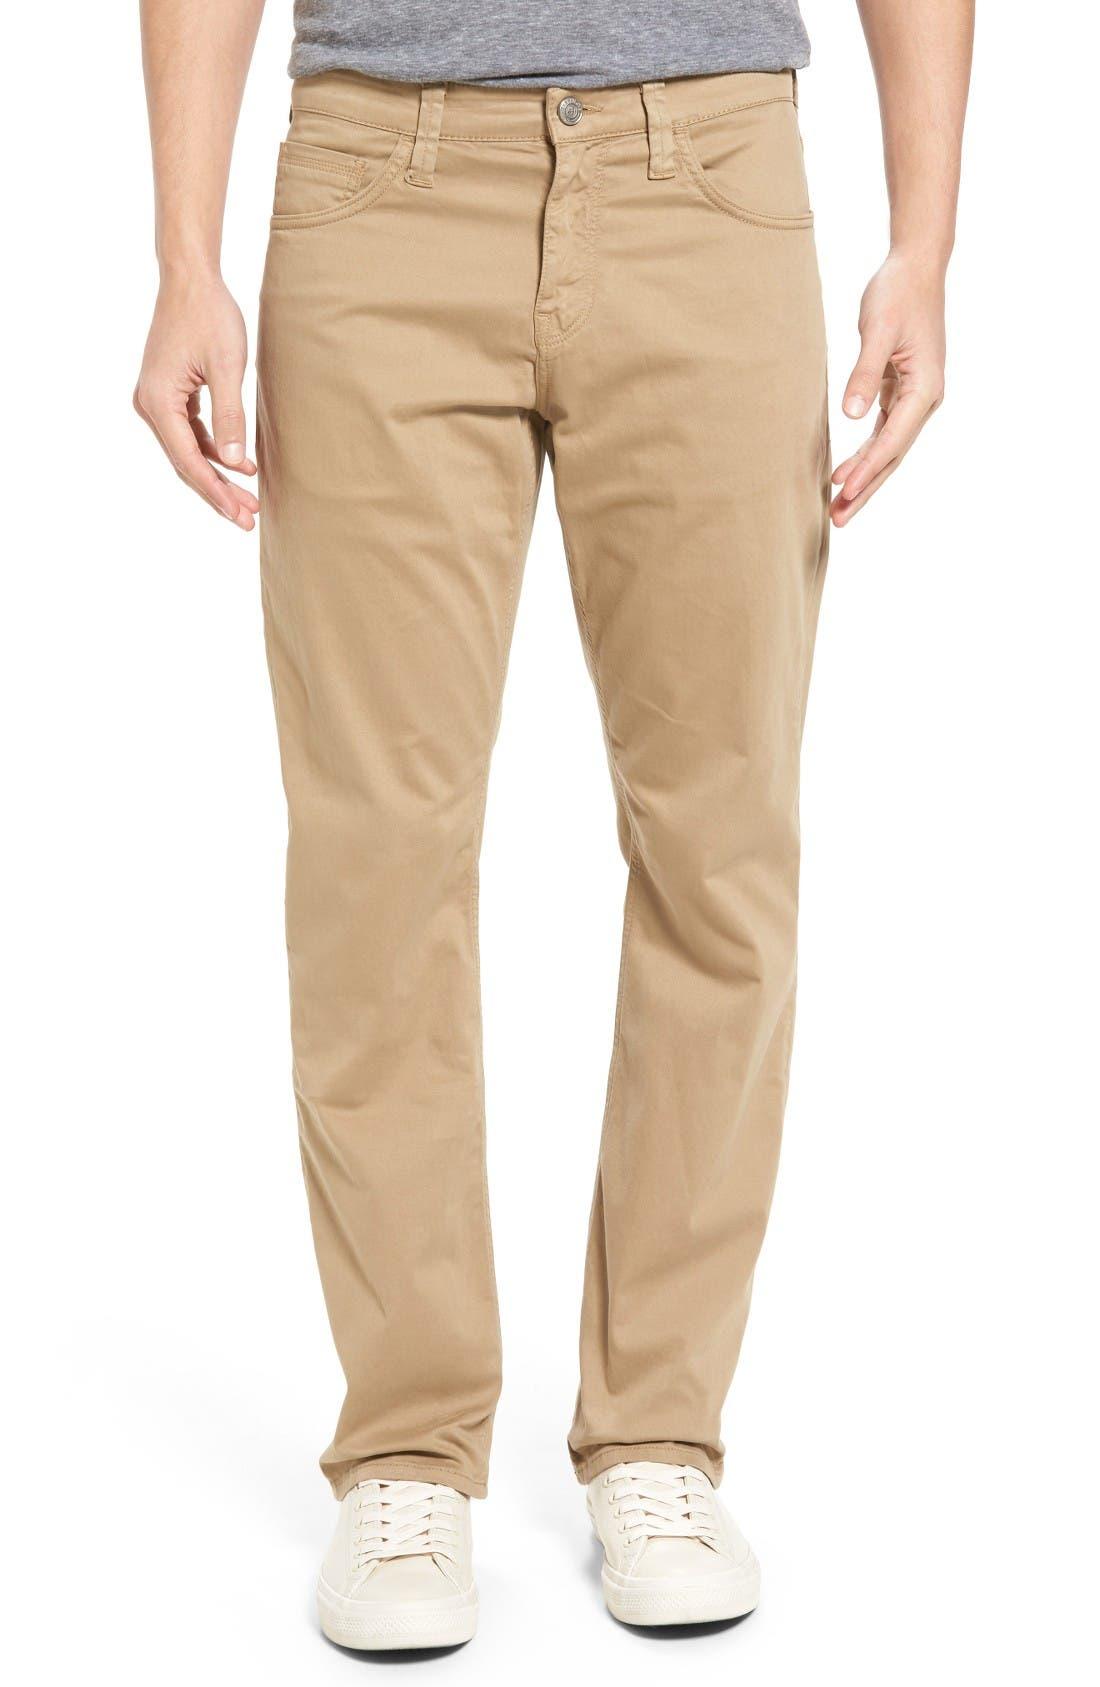 Matt Relaxed Fit Jeans,                             Main thumbnail 1, color,                             British Khaki Twill